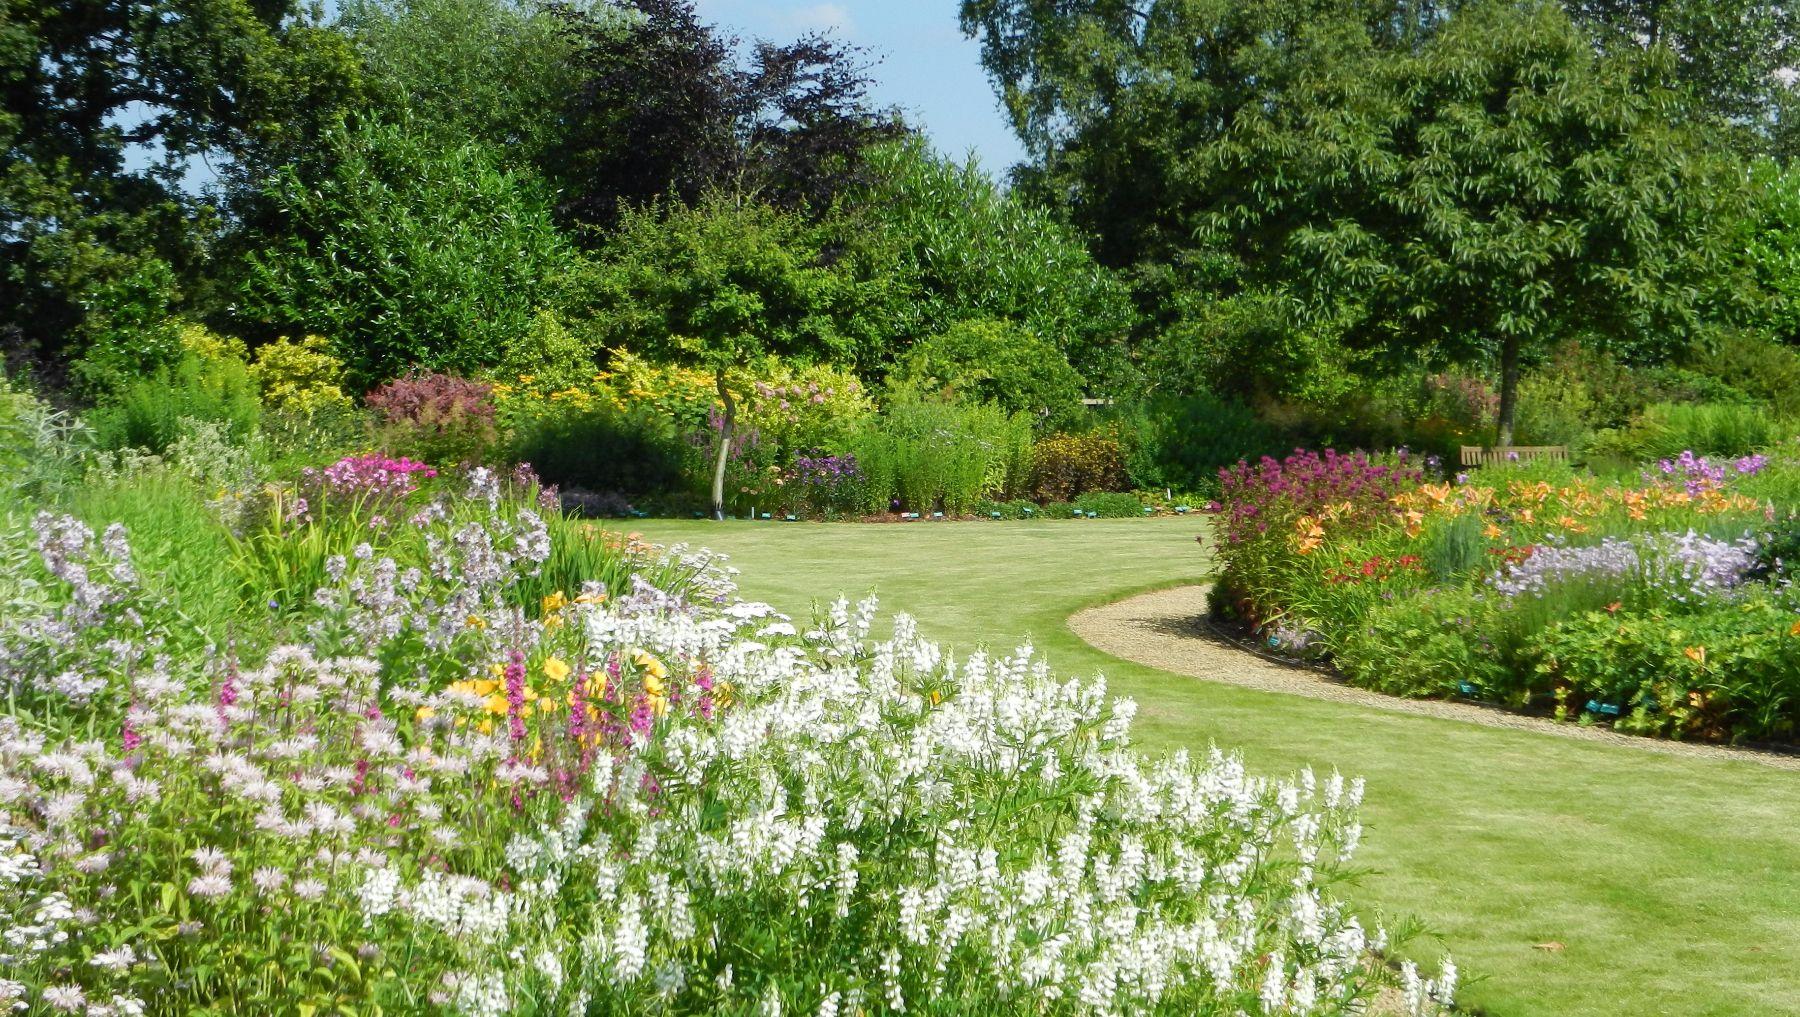 Breezy Knees Gardens, York, North Yorkshire - Castles Gardens